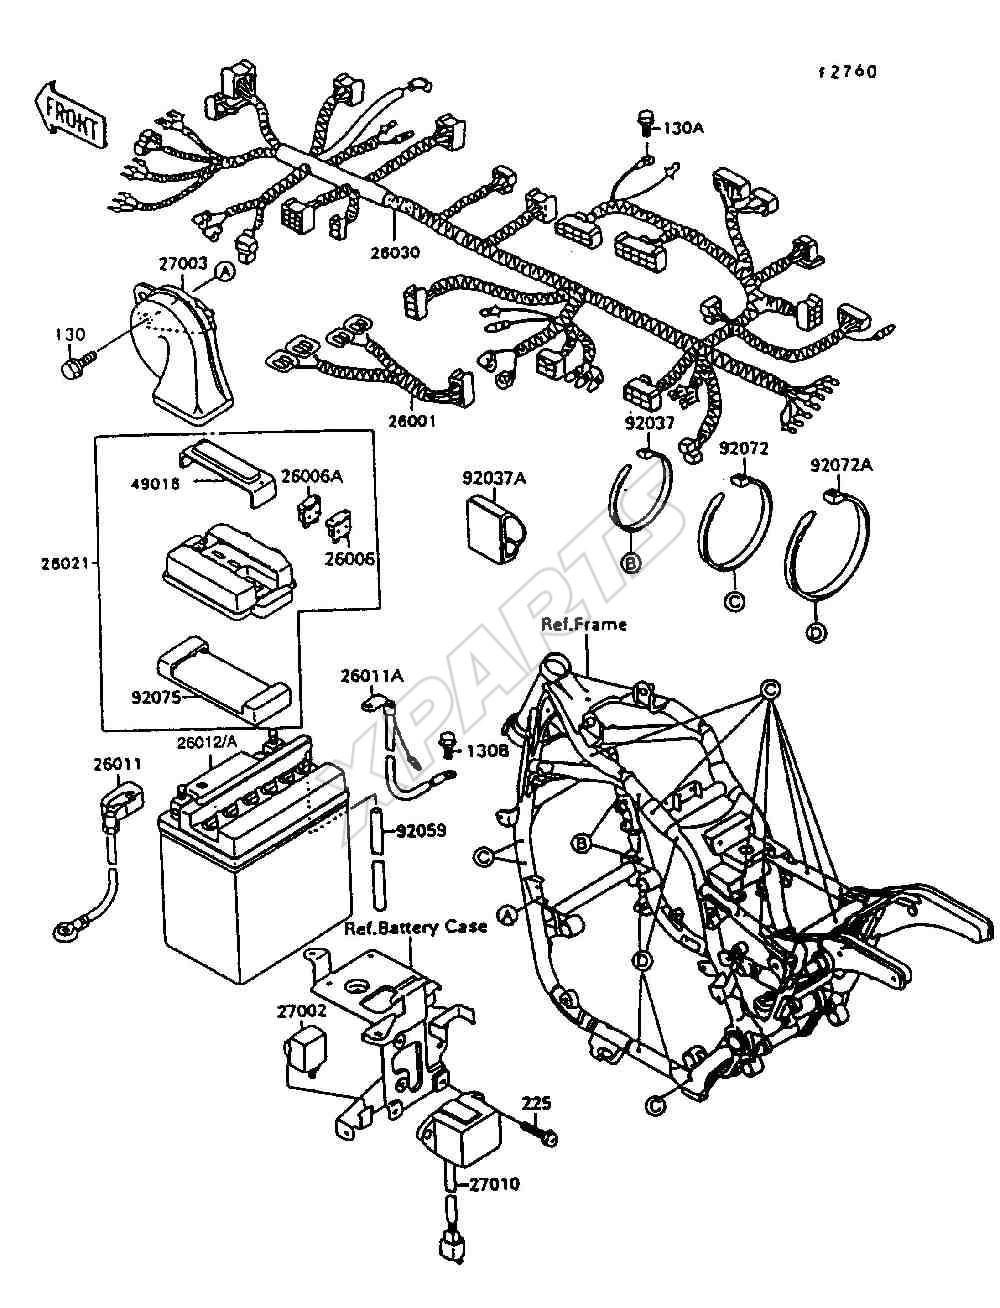 Kawasaki Vulcan 1500 Classic Wiring Diagram Kawasaki Ninja Ignition